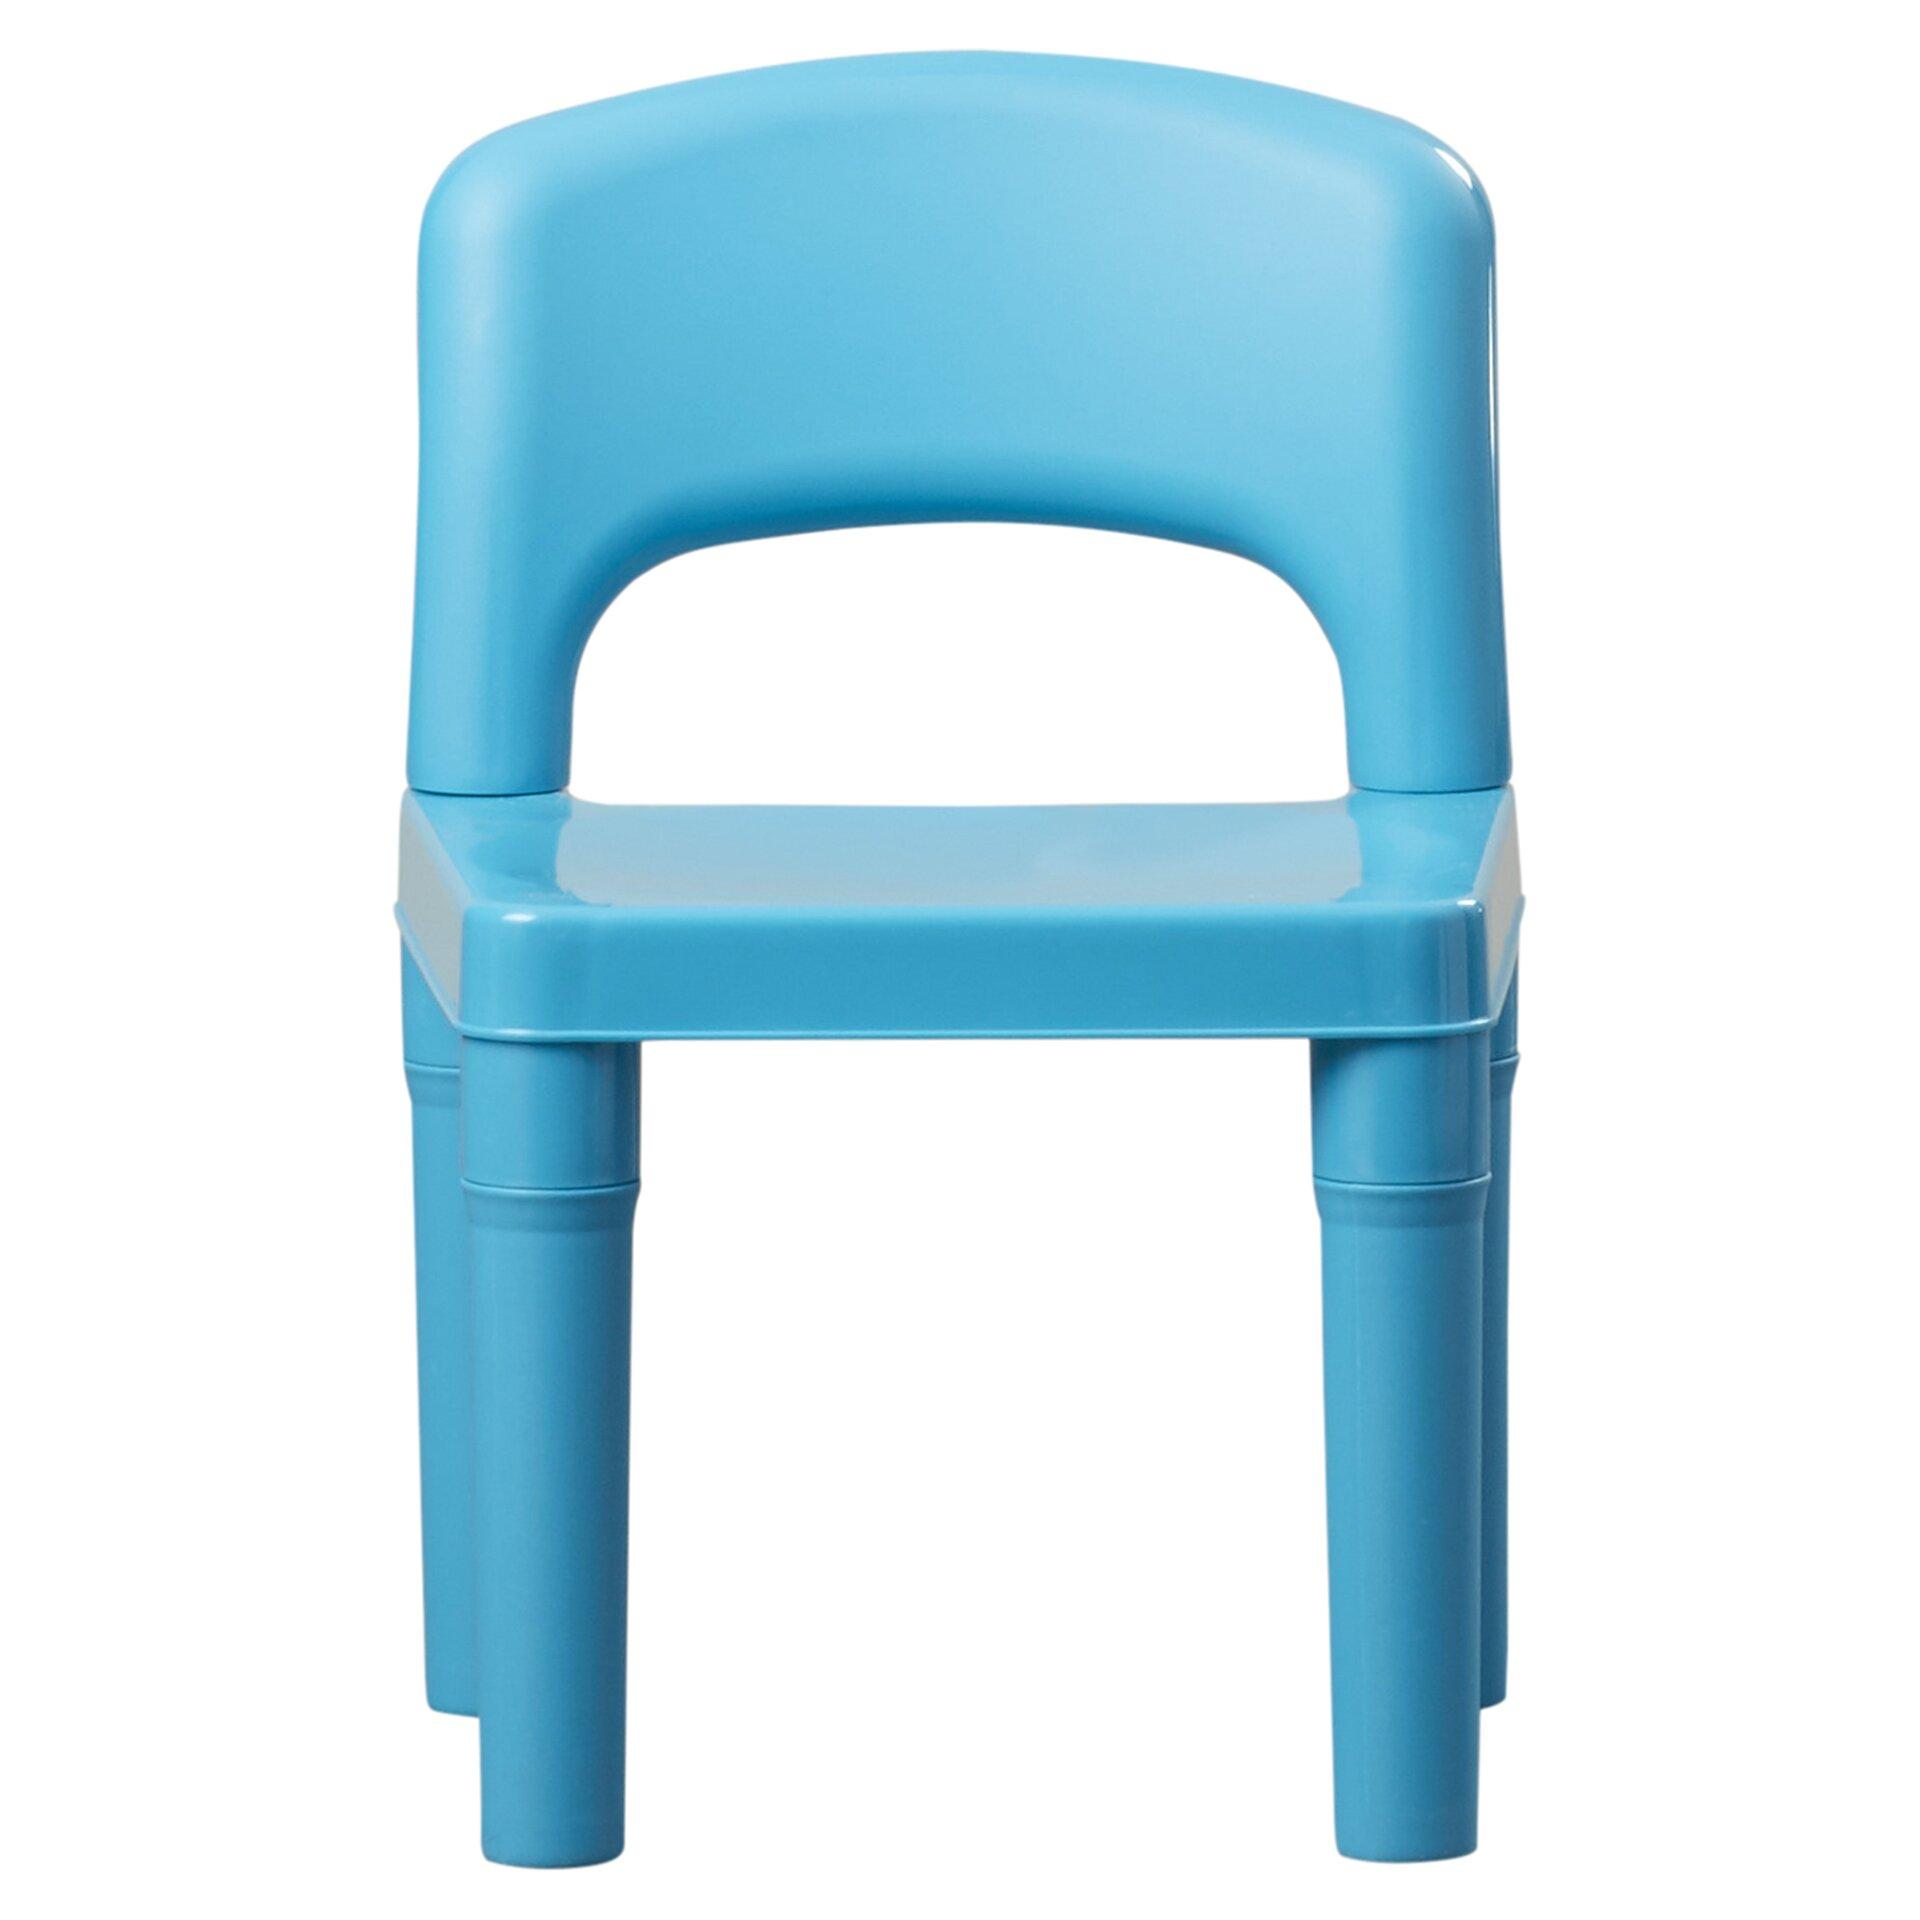 Viv Rae Jabari Kids 5 Piece Plastic Table and Chair Set  : Viv Rae Jabari Kids 5 Piece Plastic Table and Chair Set from www.wayfair.ca size 1920 x 1920 jpeg 102kB